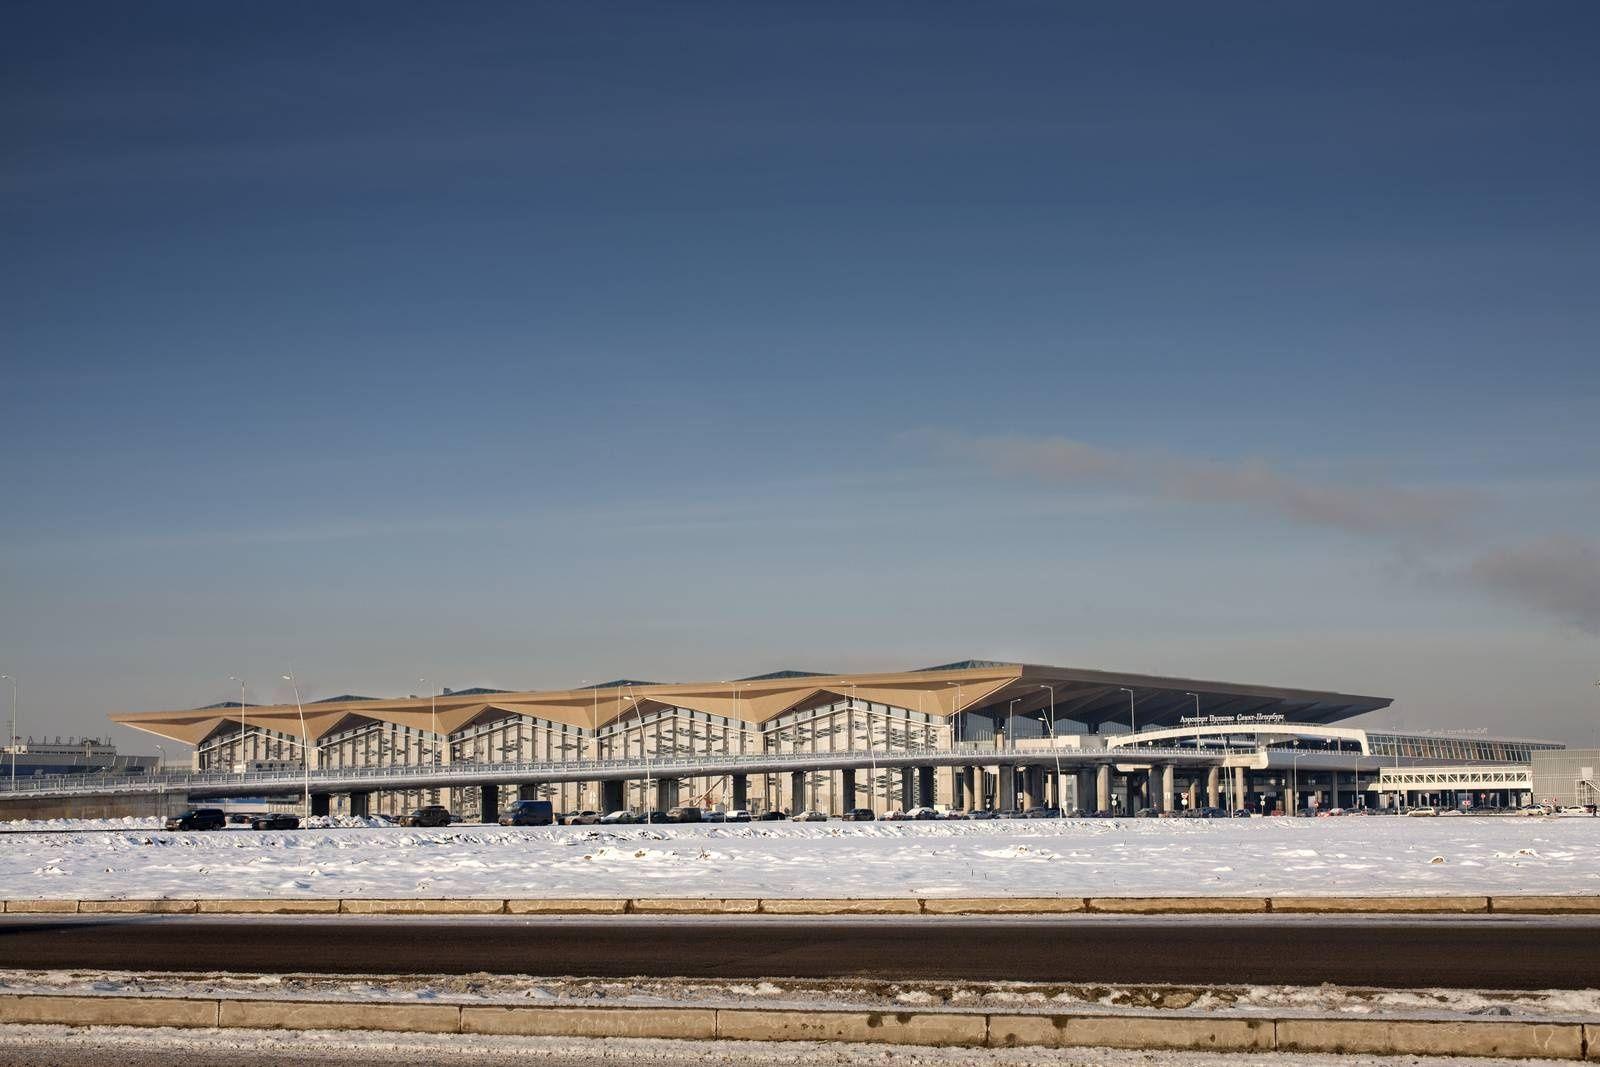 Grimshaw per il Pulkovo Airport di San Pietroburgo | Ingegneri.info